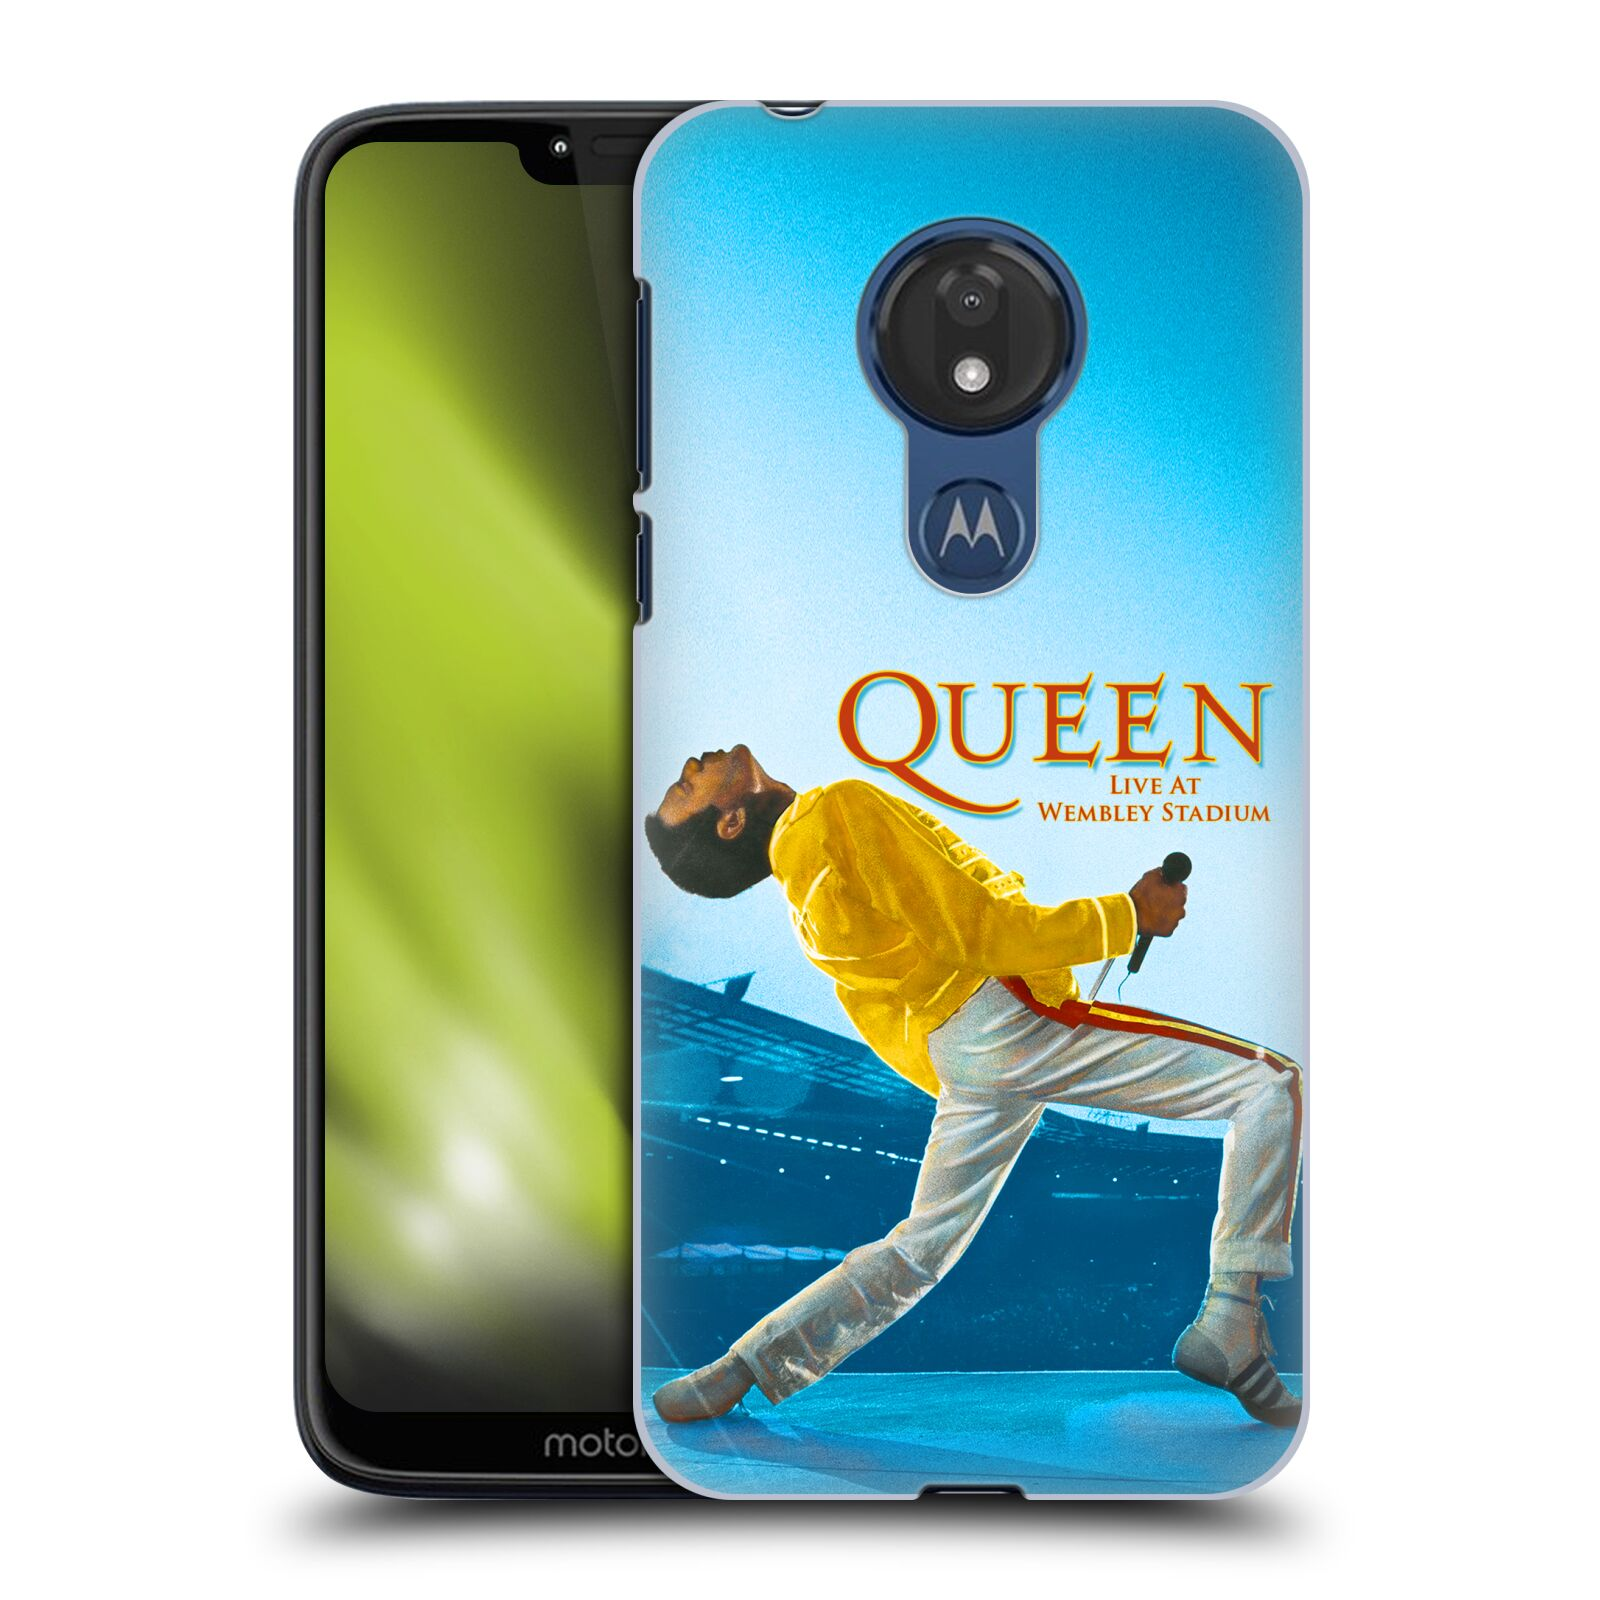 Plastové pouzdro na mobil Motorola Moto G7 Power - Head Case - Queen - Freddie Mercury